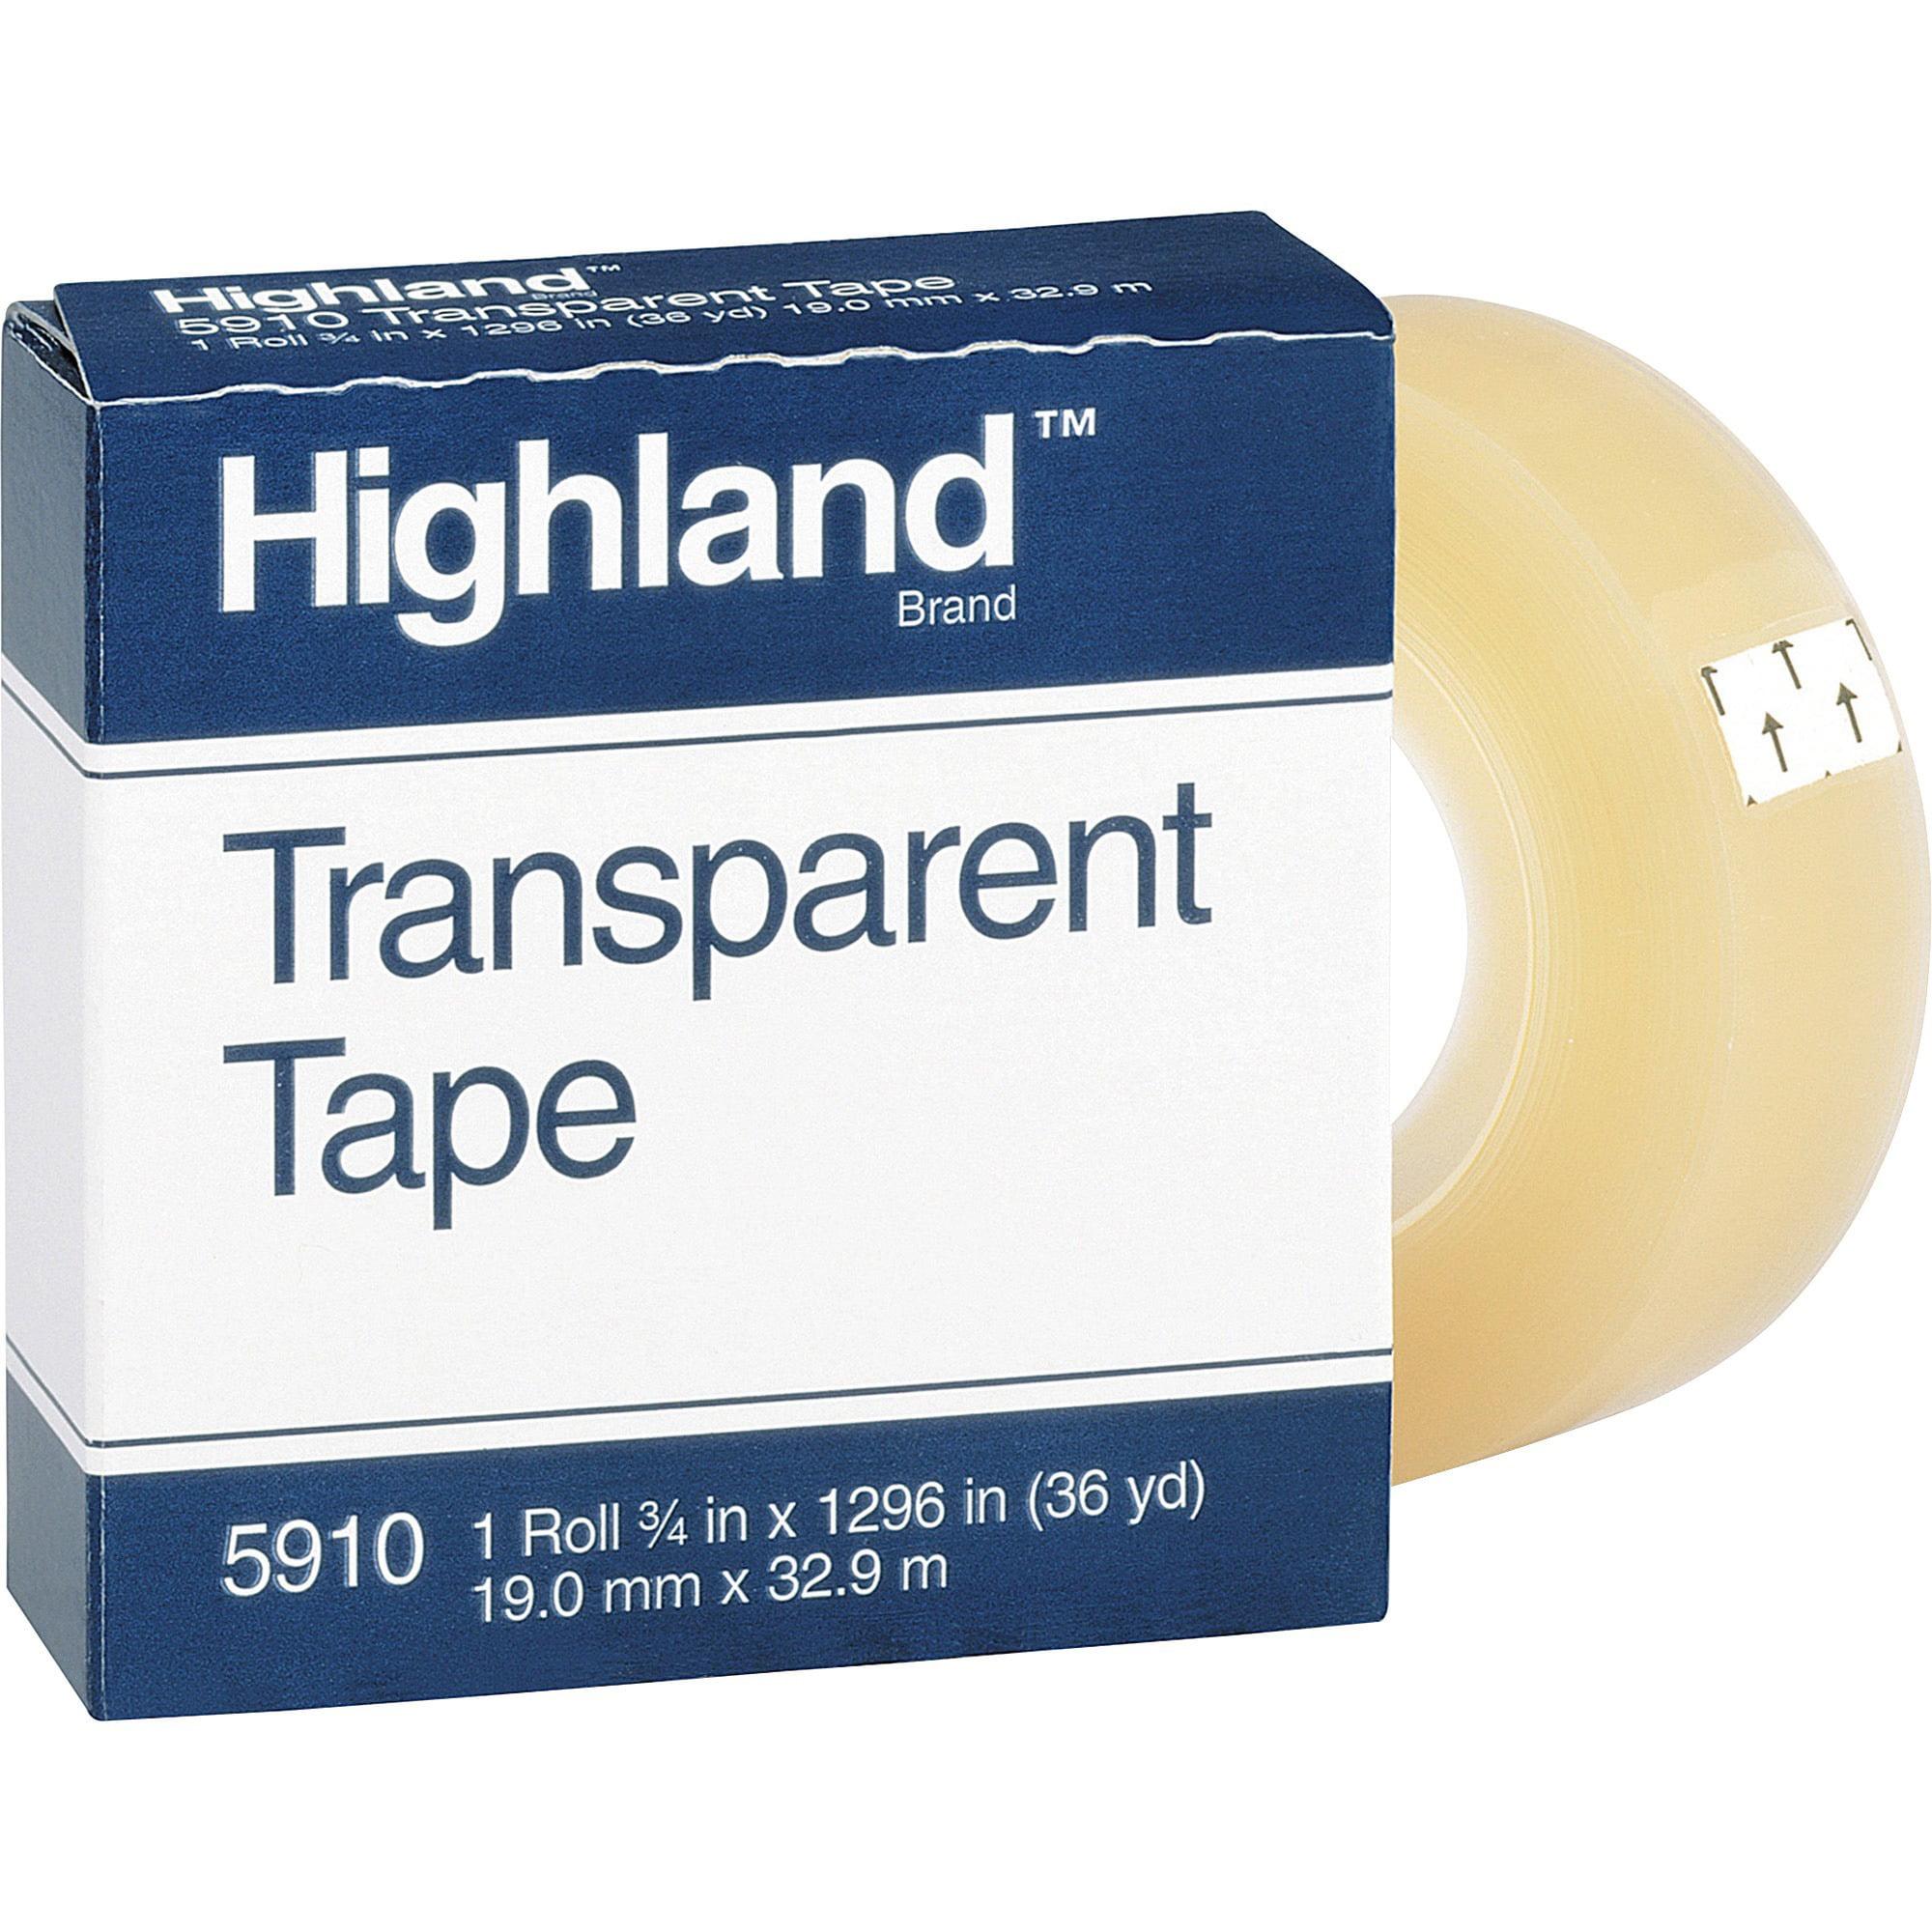 Highland, MMM5910341296, Transparent Light-duty Tape, 1 Roll, Clear